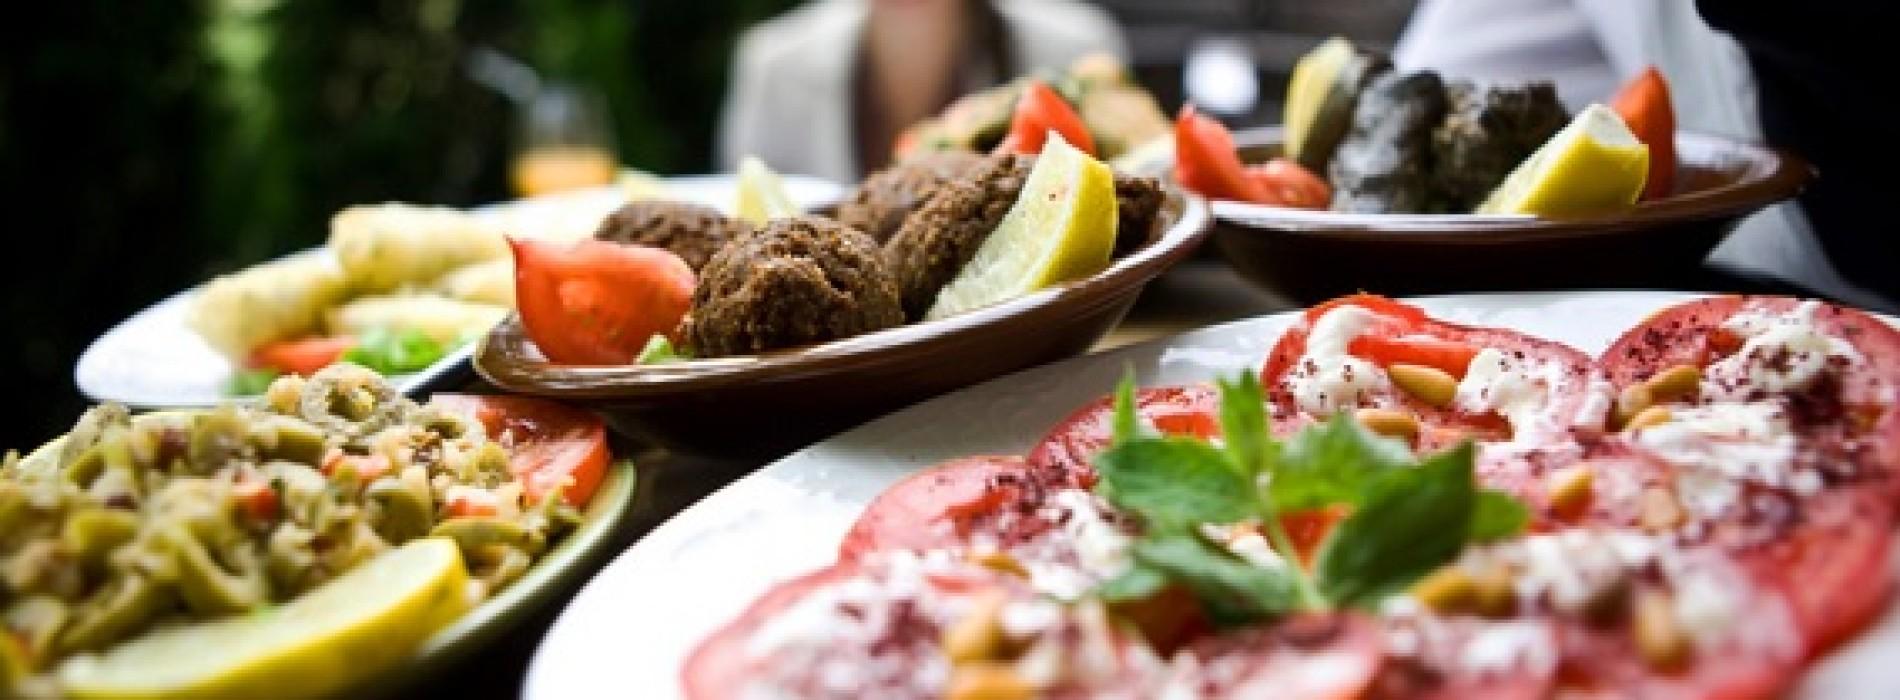 Podatek VAT za usługi gastronomiczne i cateringowe